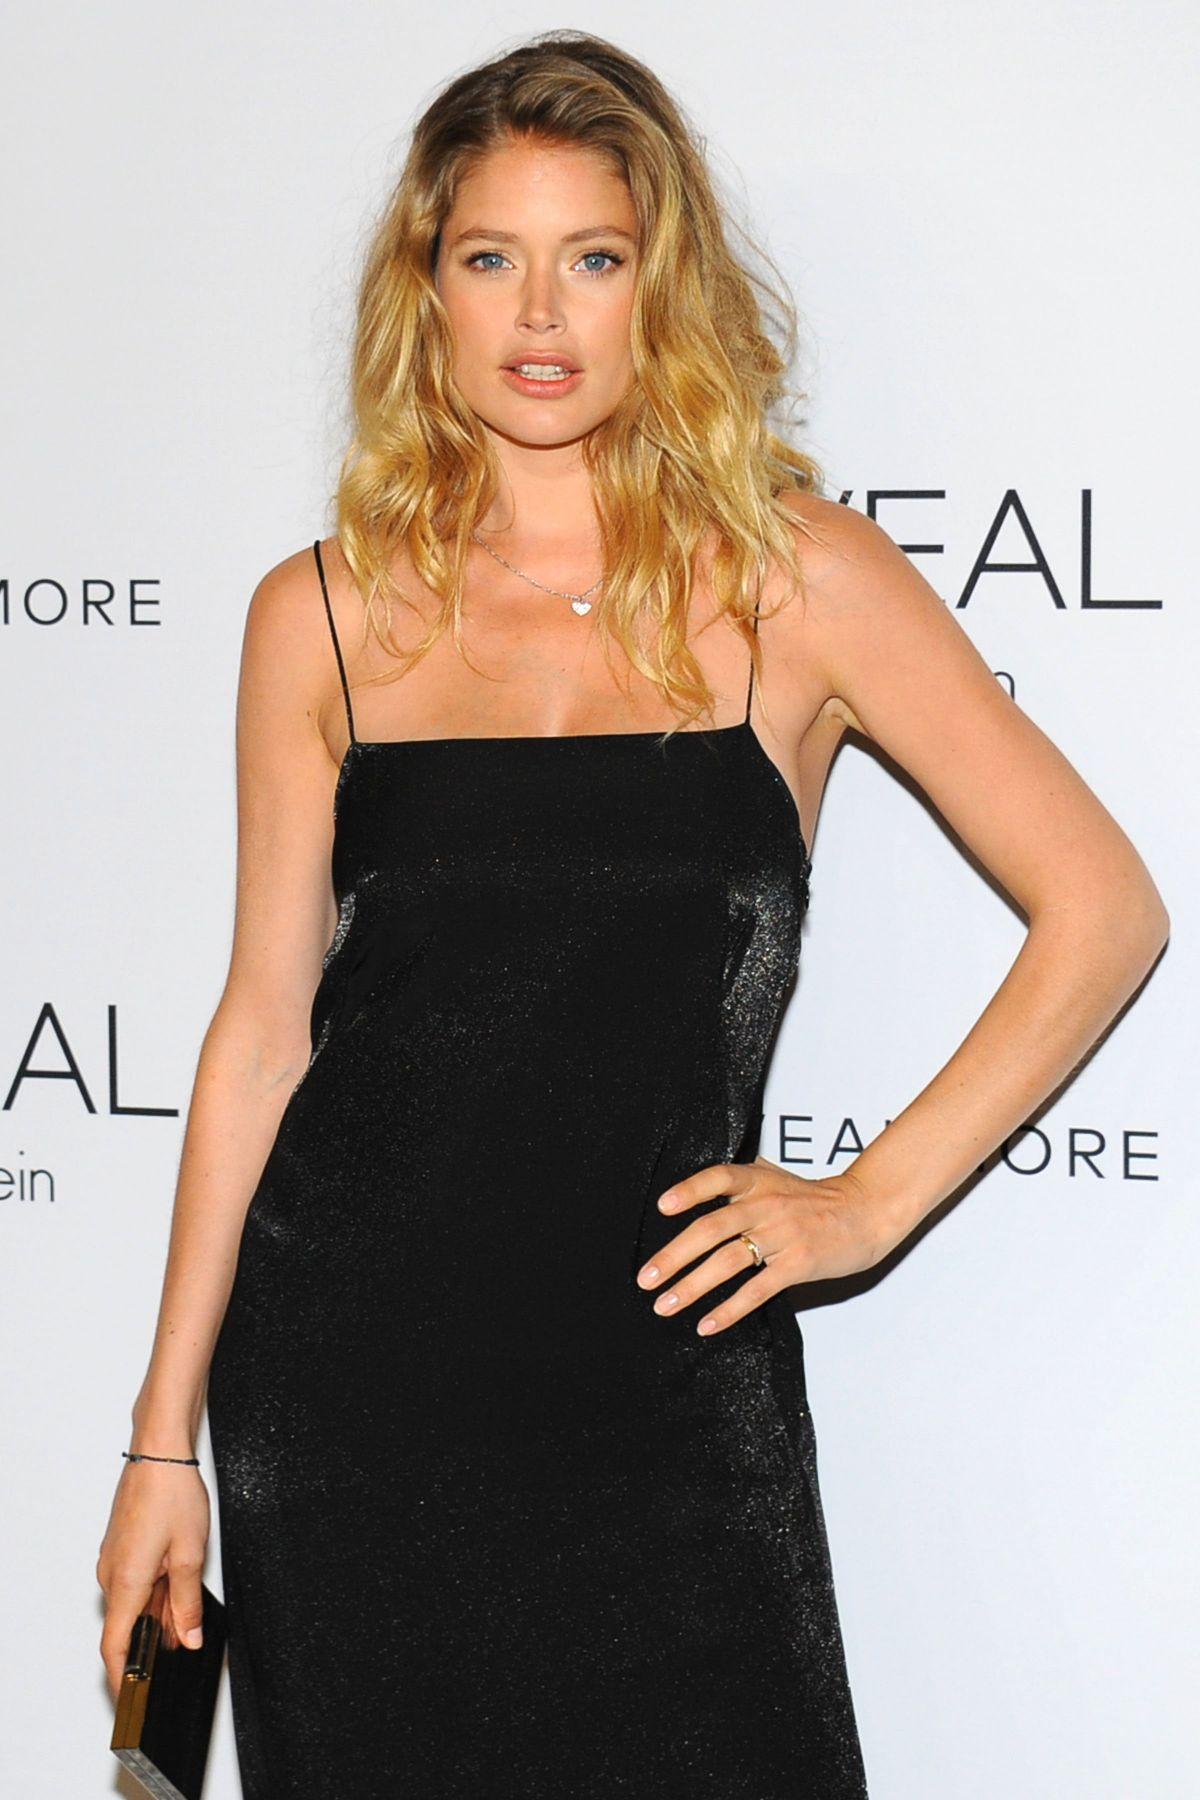 DOUTZEN KROES at Reveal Calvin Klein Fragrance Launch in New York